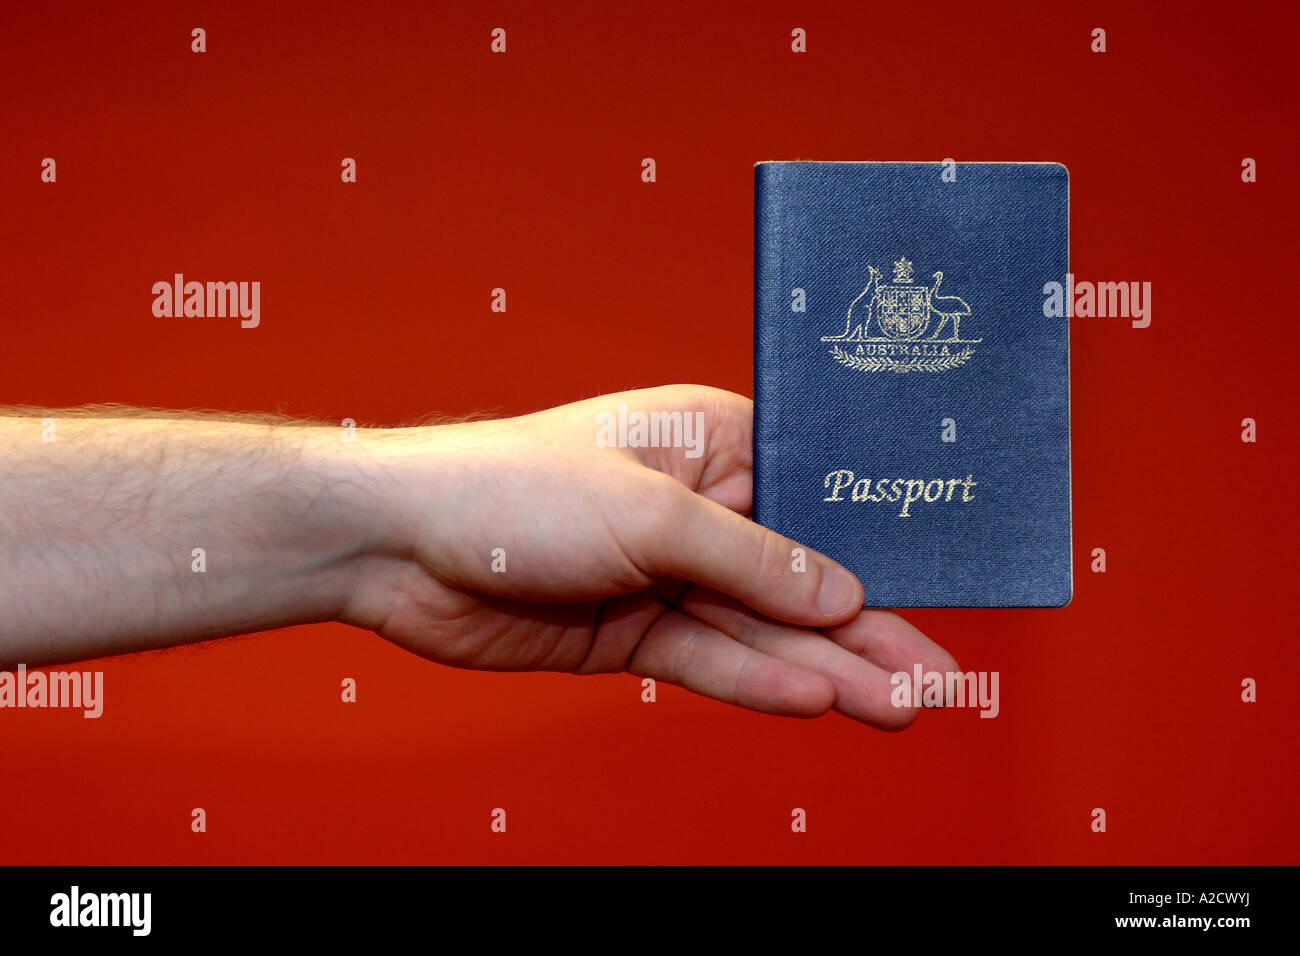 Passport Visa Stock Australian Australia Cover Stock Photos